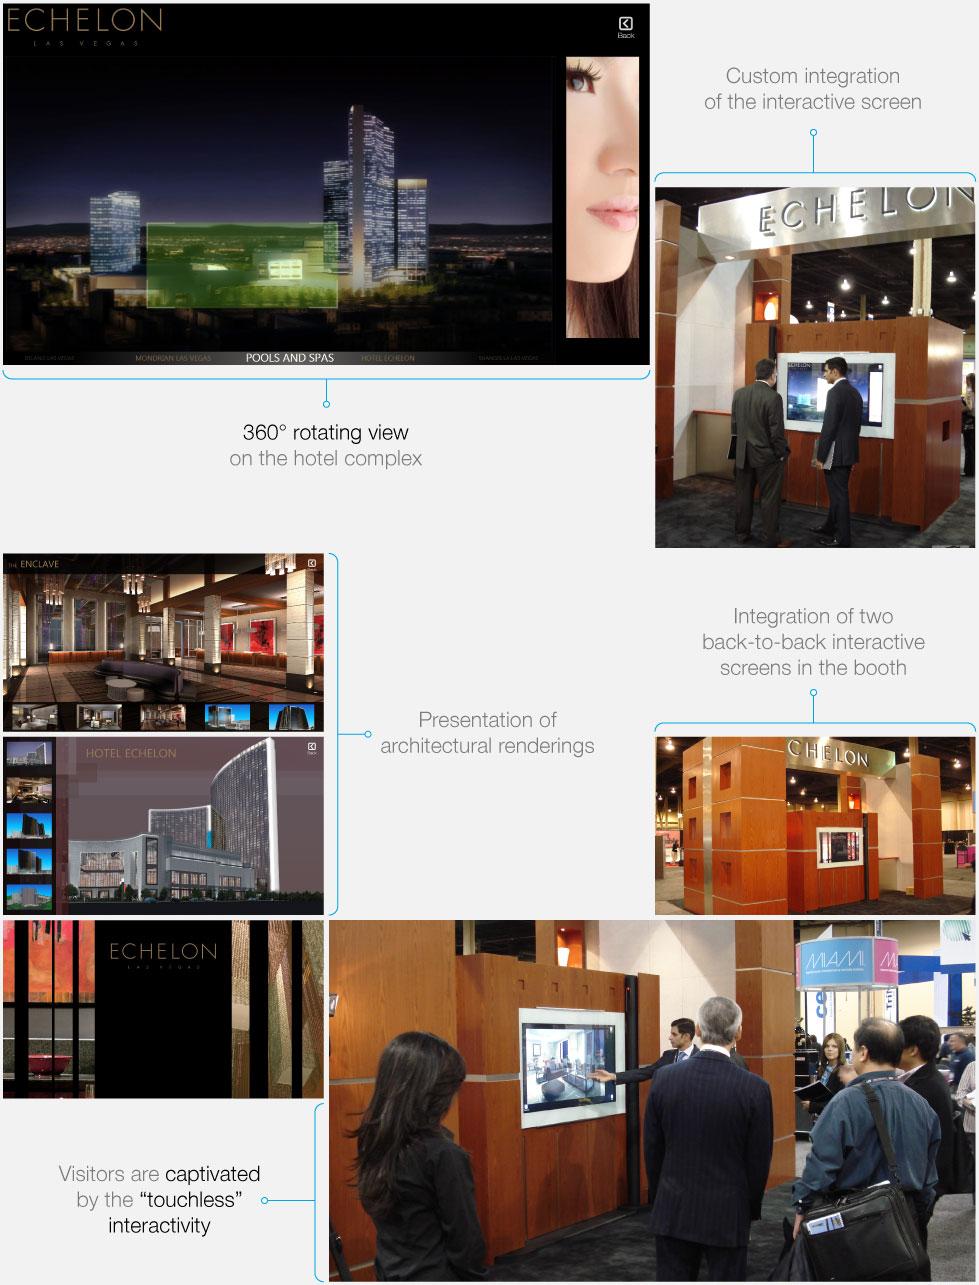 Echelon Hotel presentation touchscreen